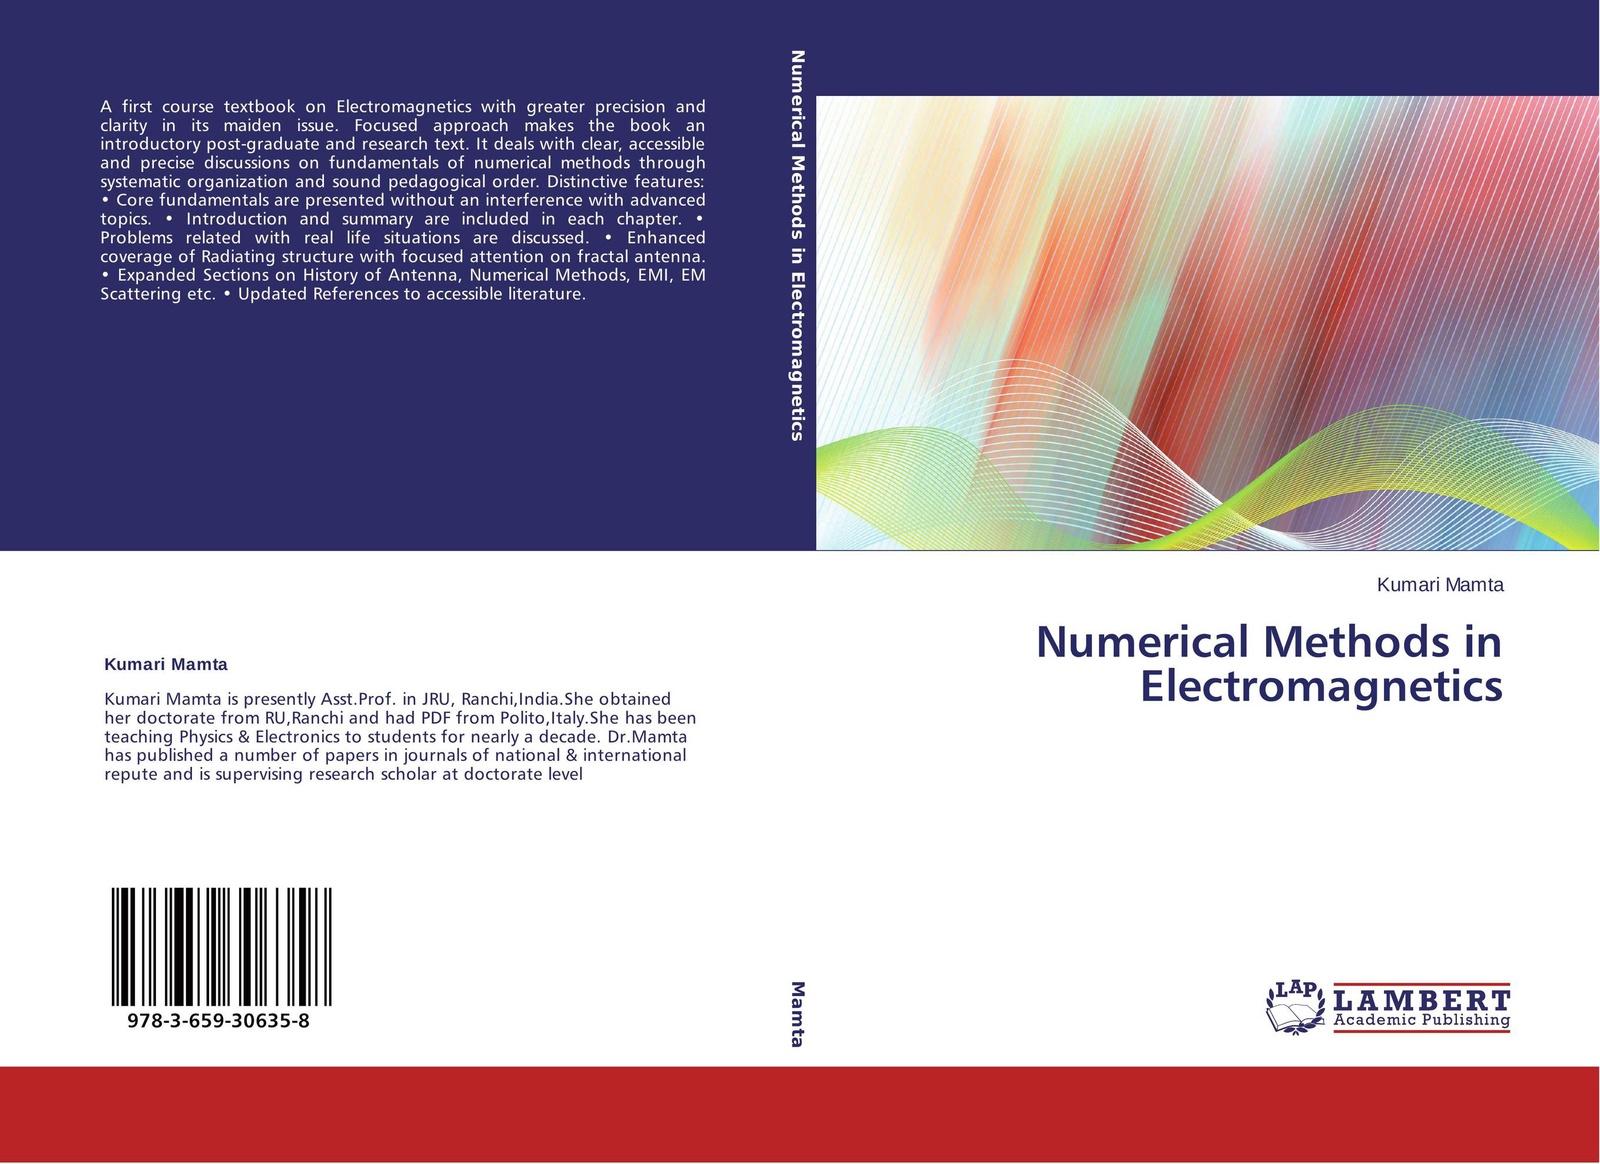 Kumari Mamta Numerical Methods in Electromagnetics